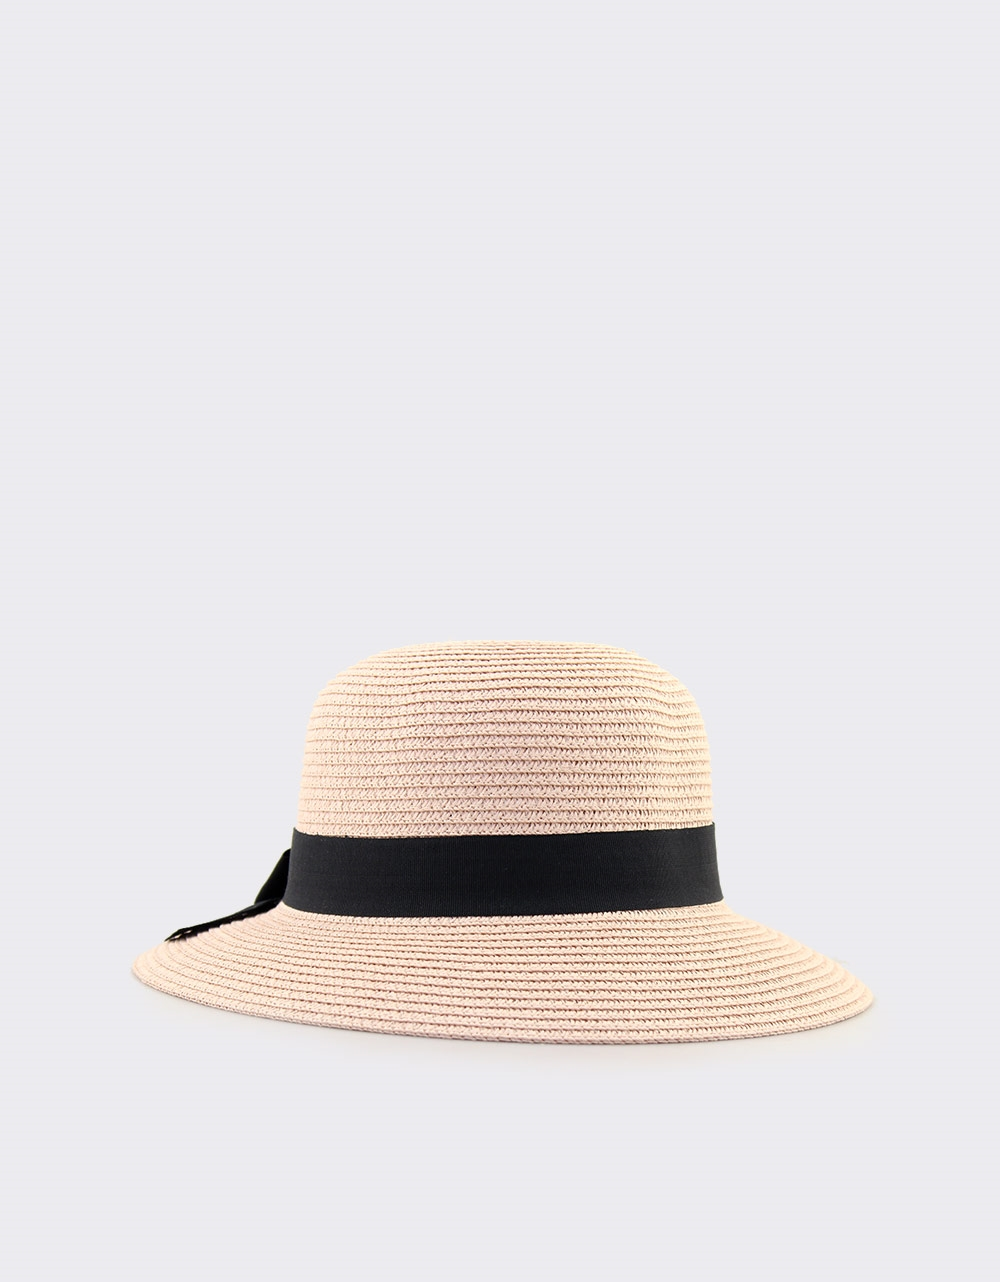 5737fc3b5e Εικόνα από Γυναικεία καπέλα ψάθινα με κορδέλα Ροζ